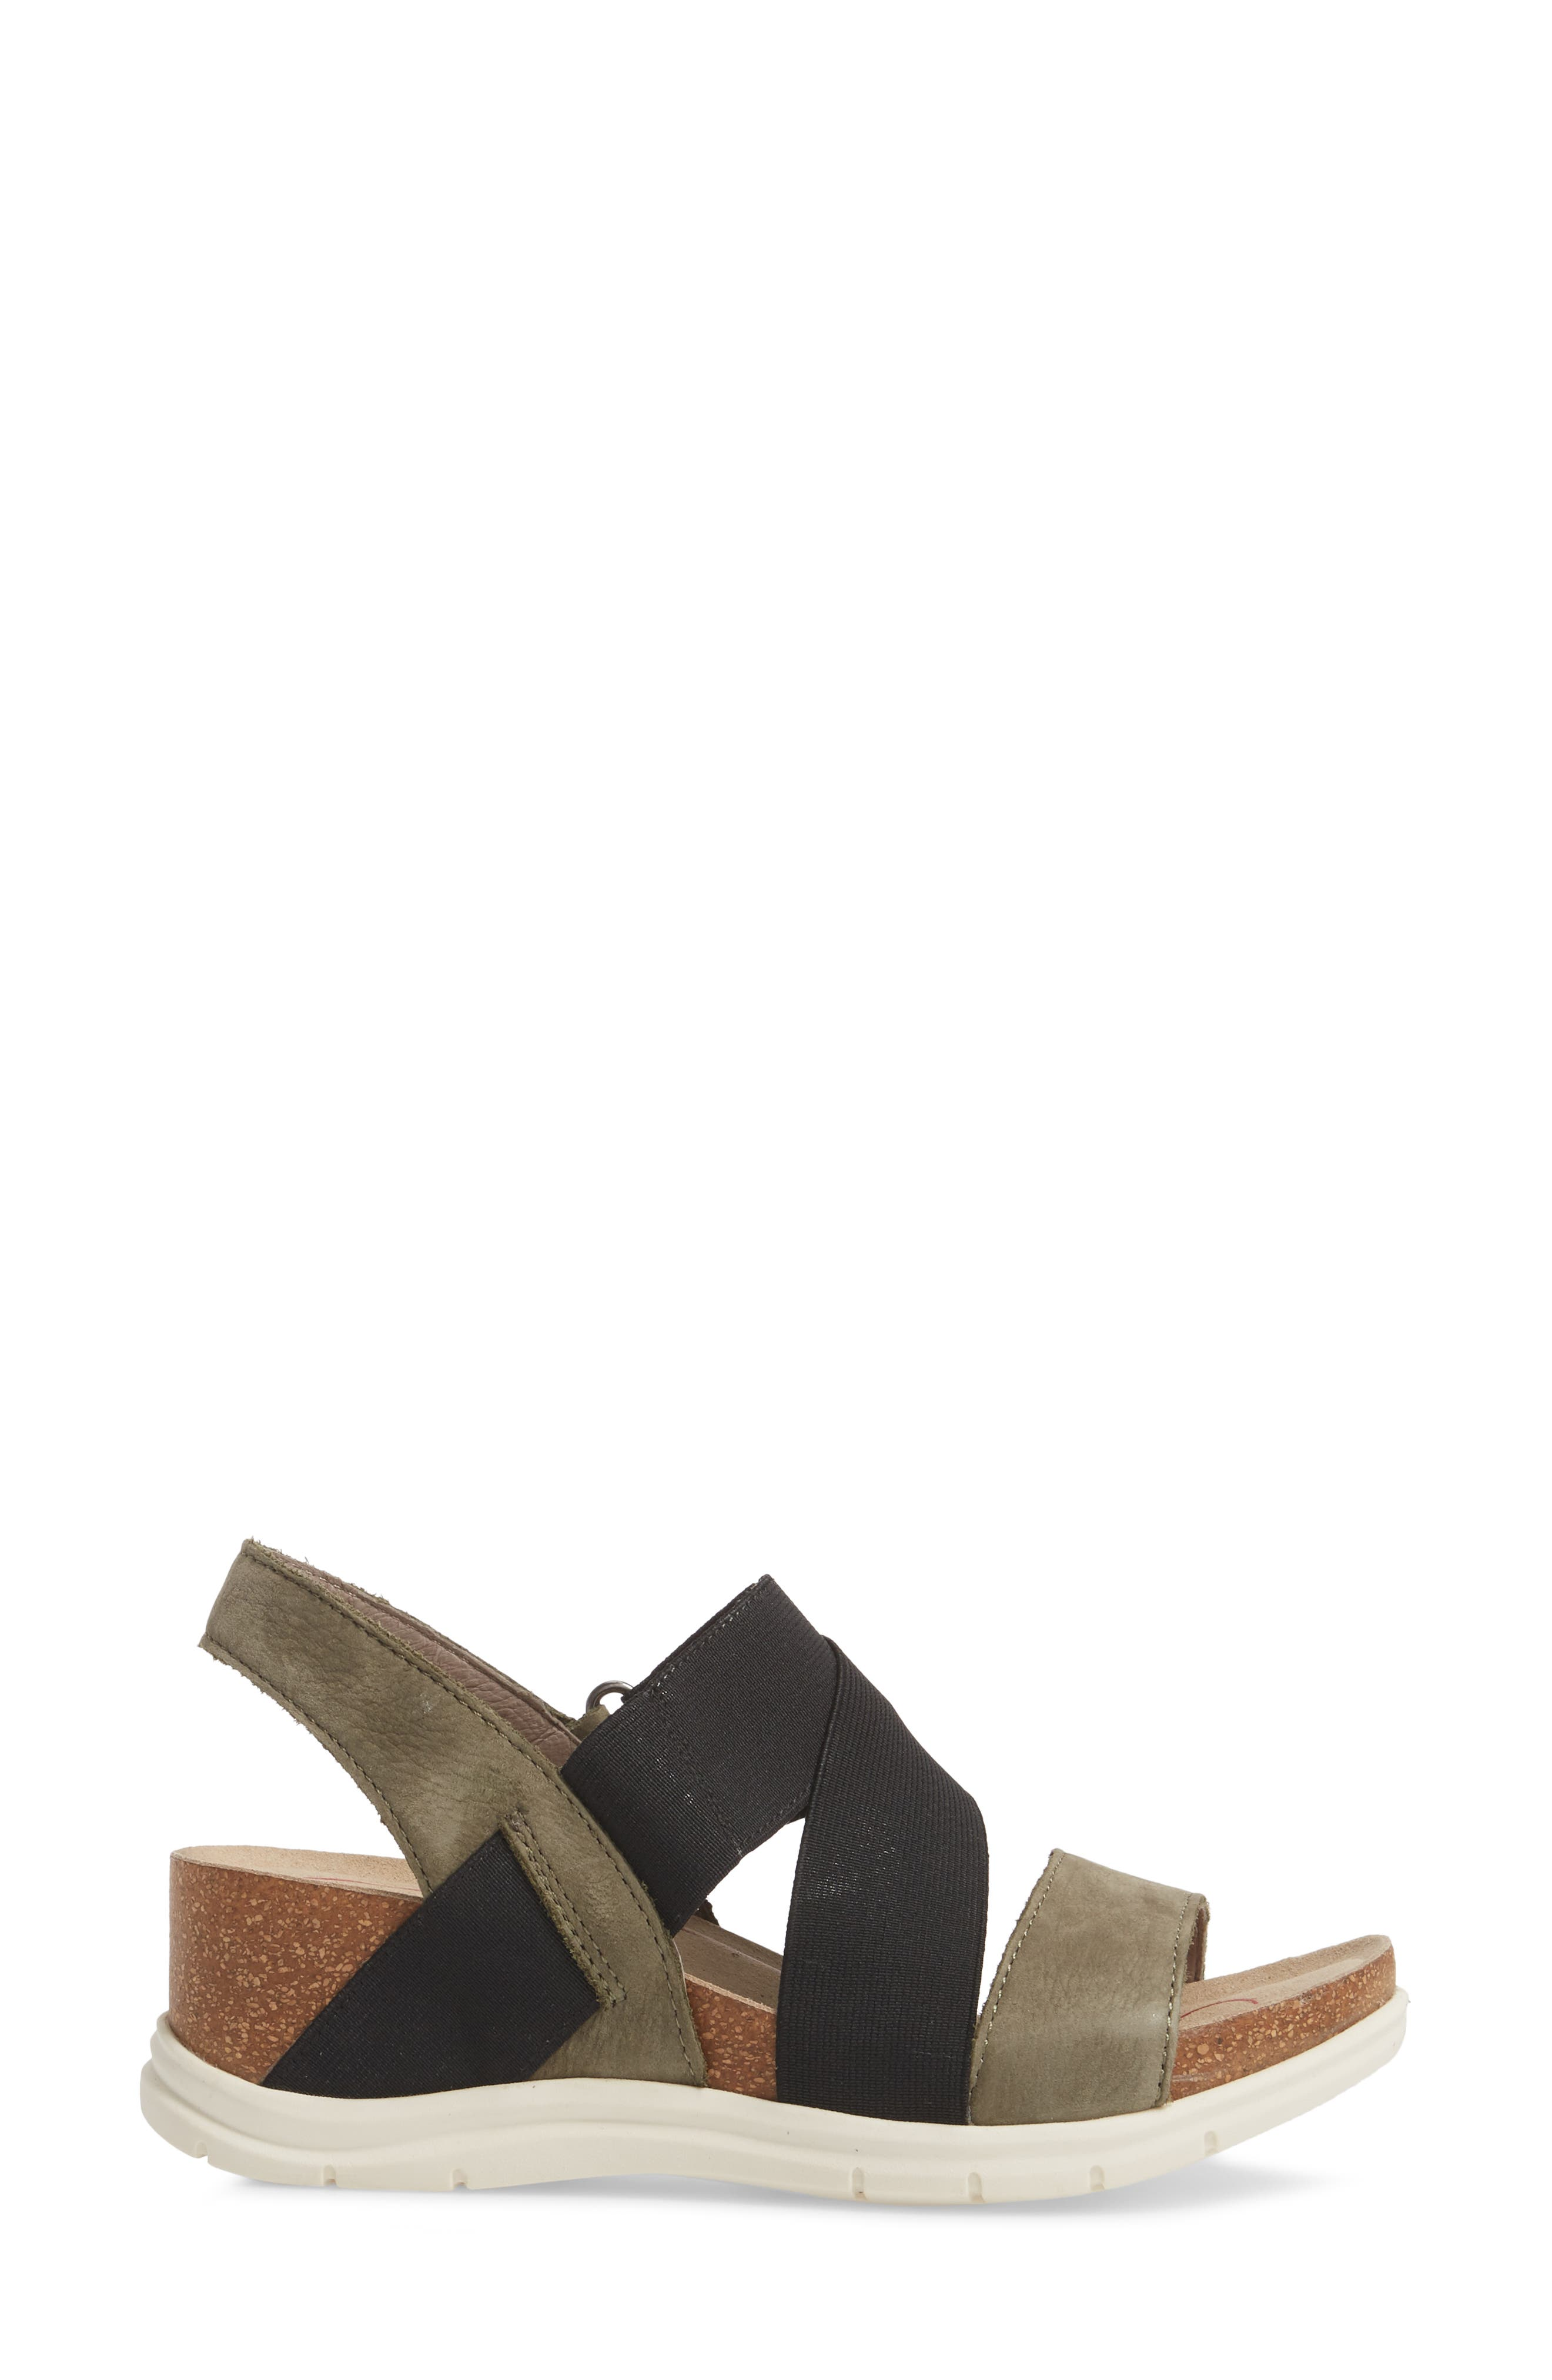 Paisley Wedge Sandal,                             Alternate thumbnail 11, color,